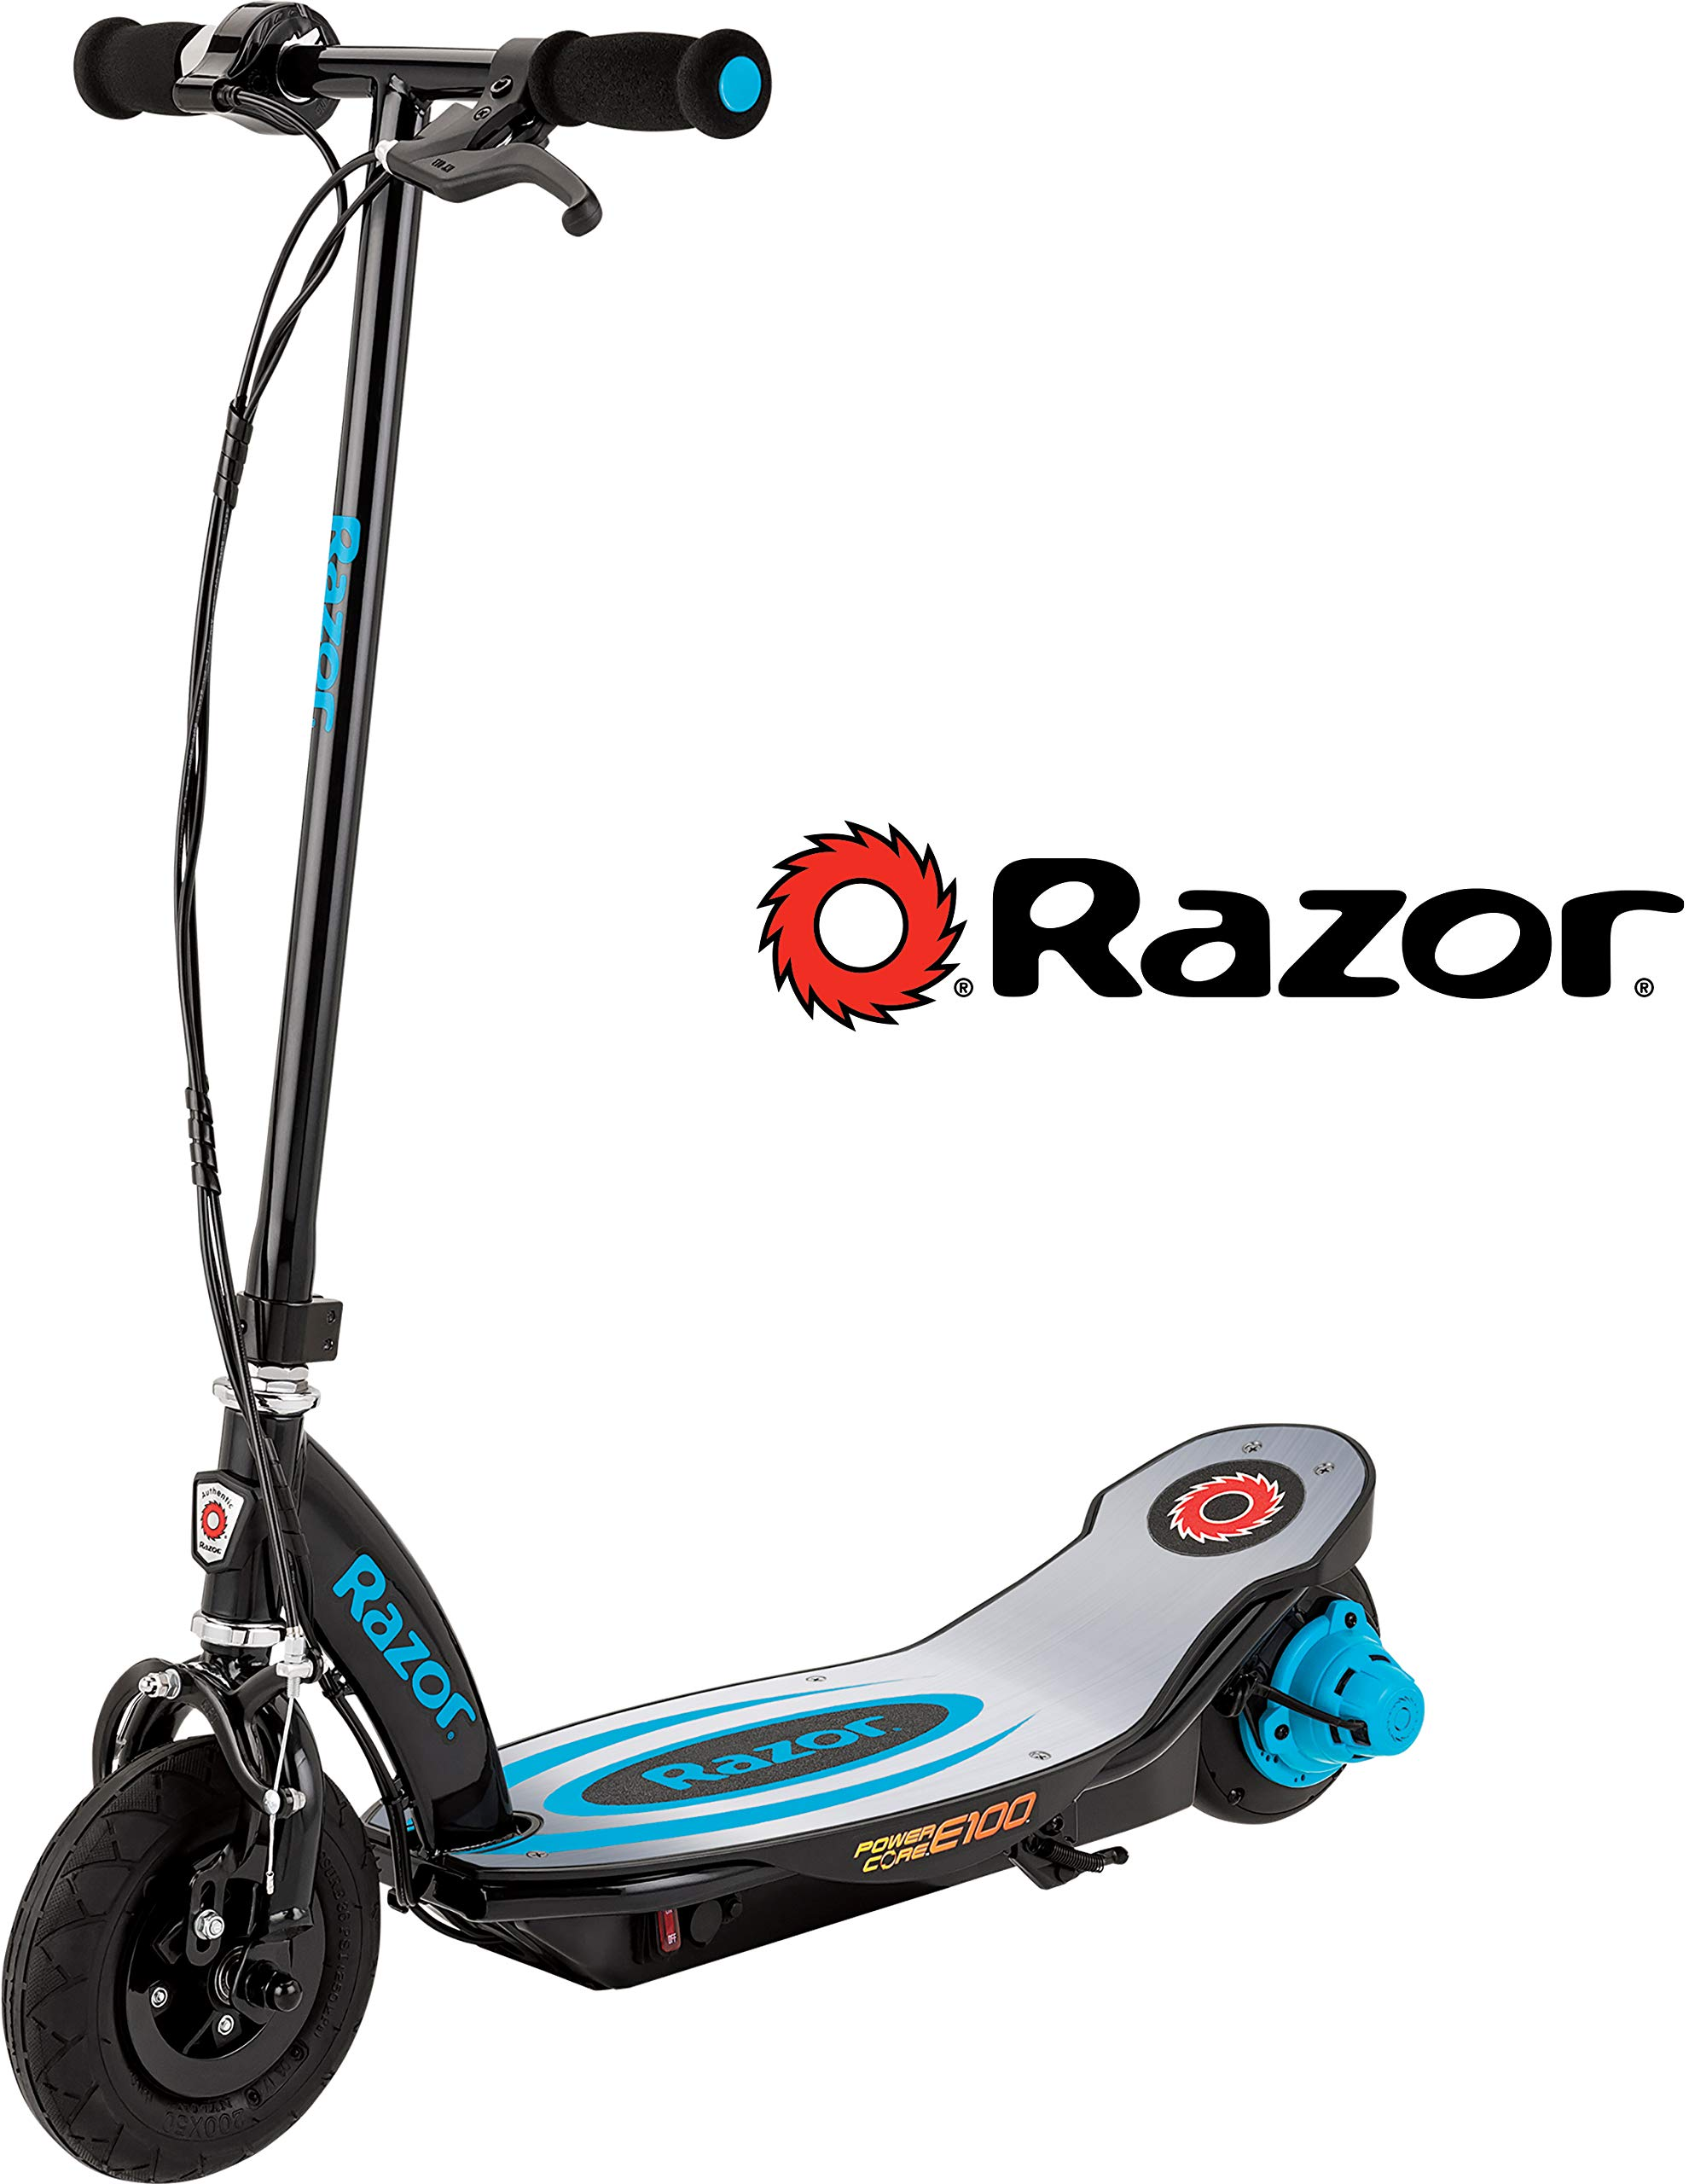 Razor Power Core E100 Electric Scooter with Aluminum Deck - Blue